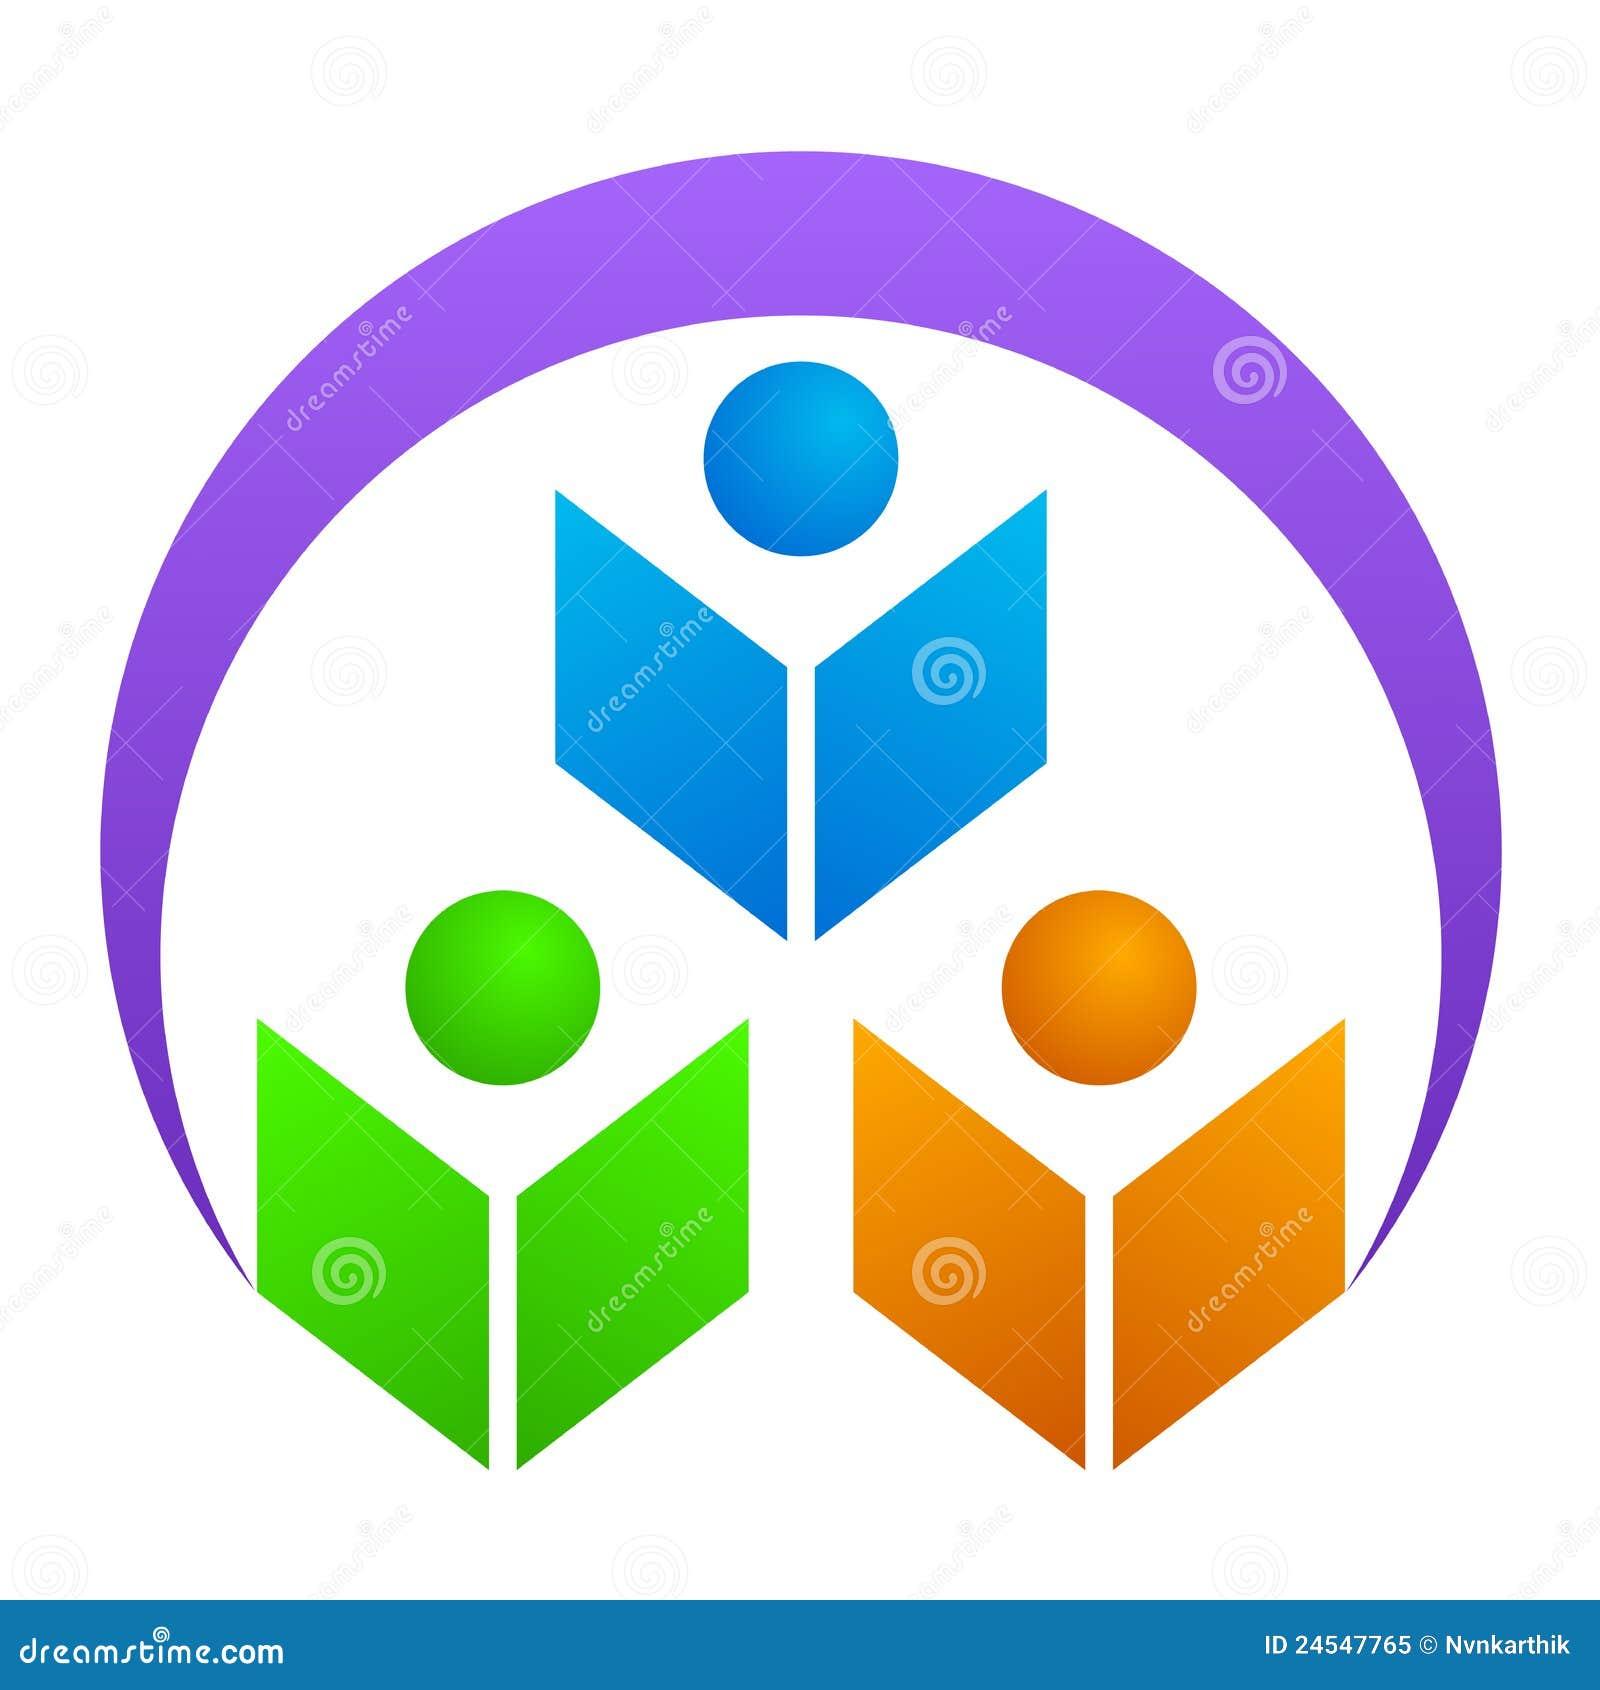 education logo stock vector illustration of degree icon 24547765